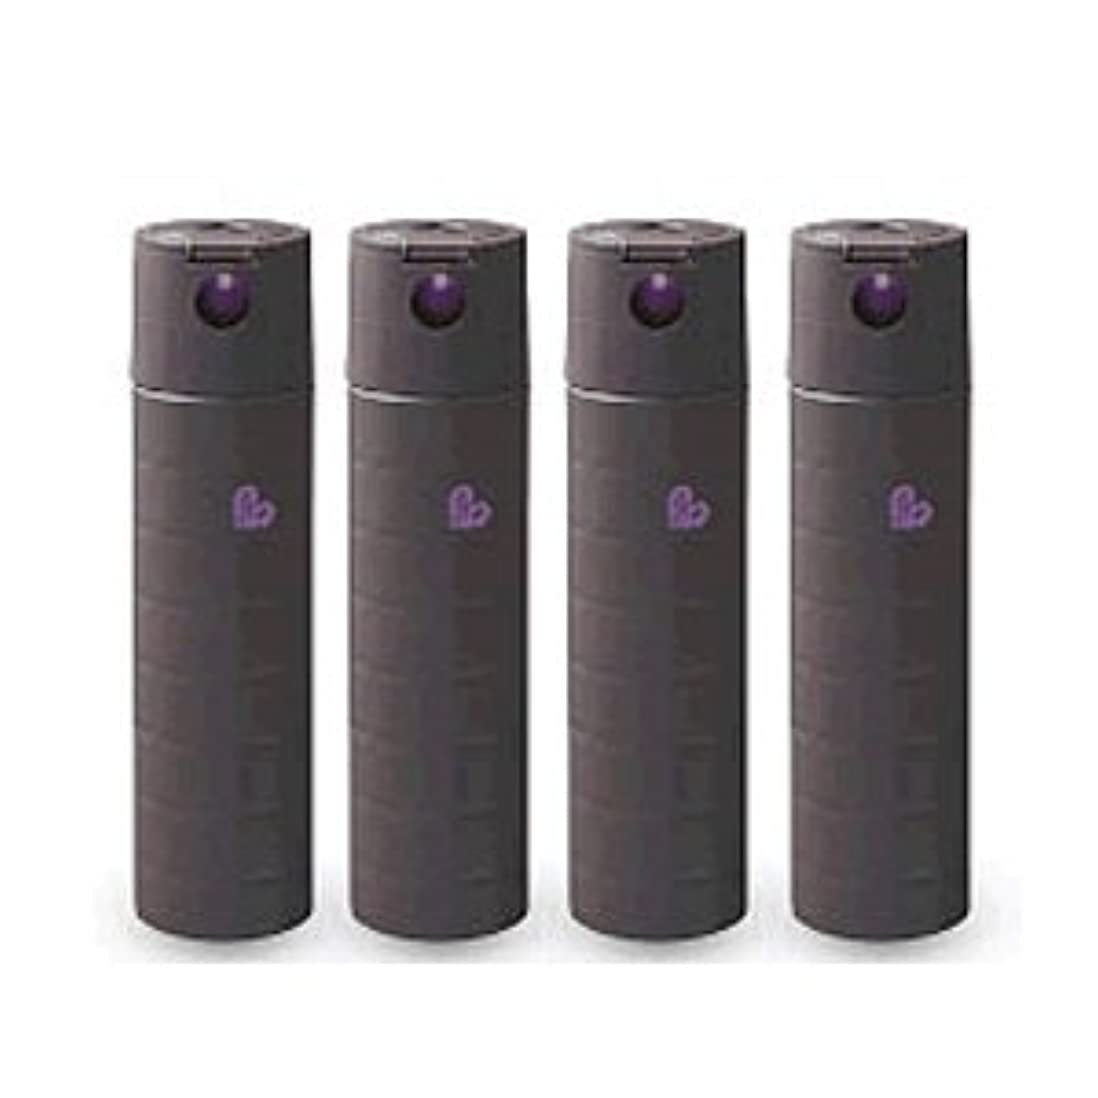 【X4個セット】 アリミノ ピース カールspray チョコ 138g 200ml スプレーライン